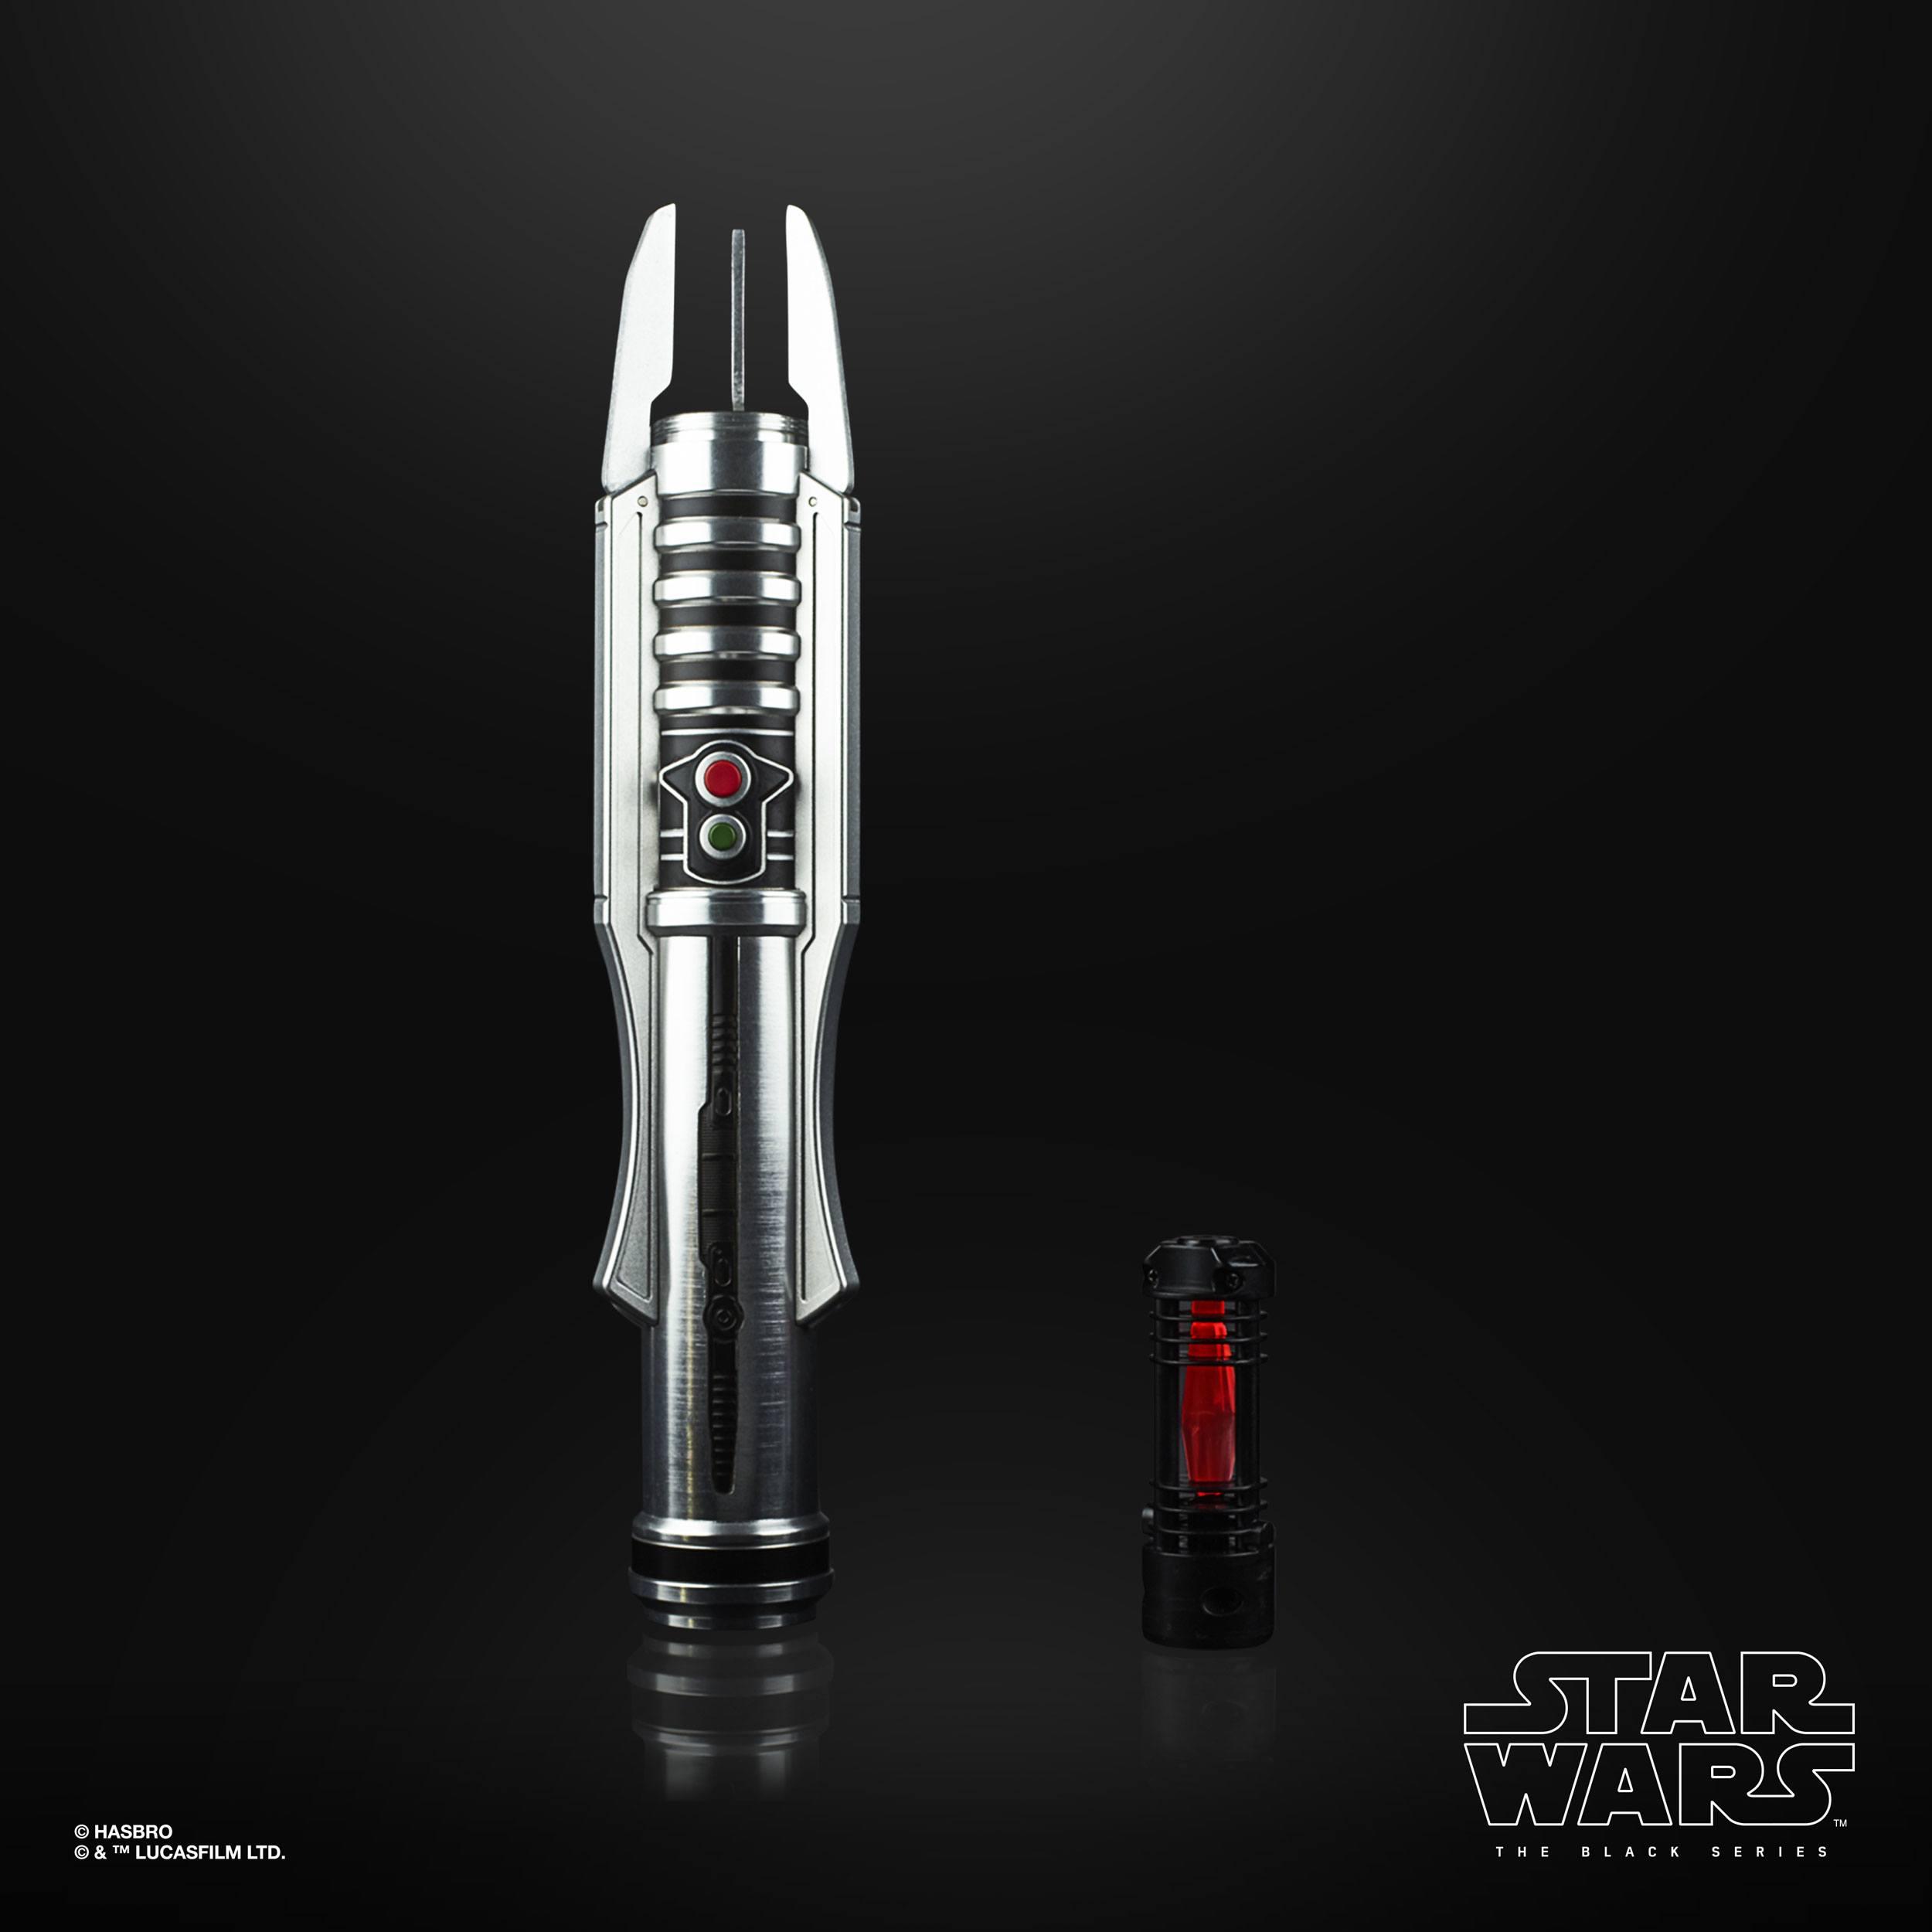 Star Wars The Black Series Elite Darth Revan Force FX Lightsaber Prop Replica E89405L00 5010993691814